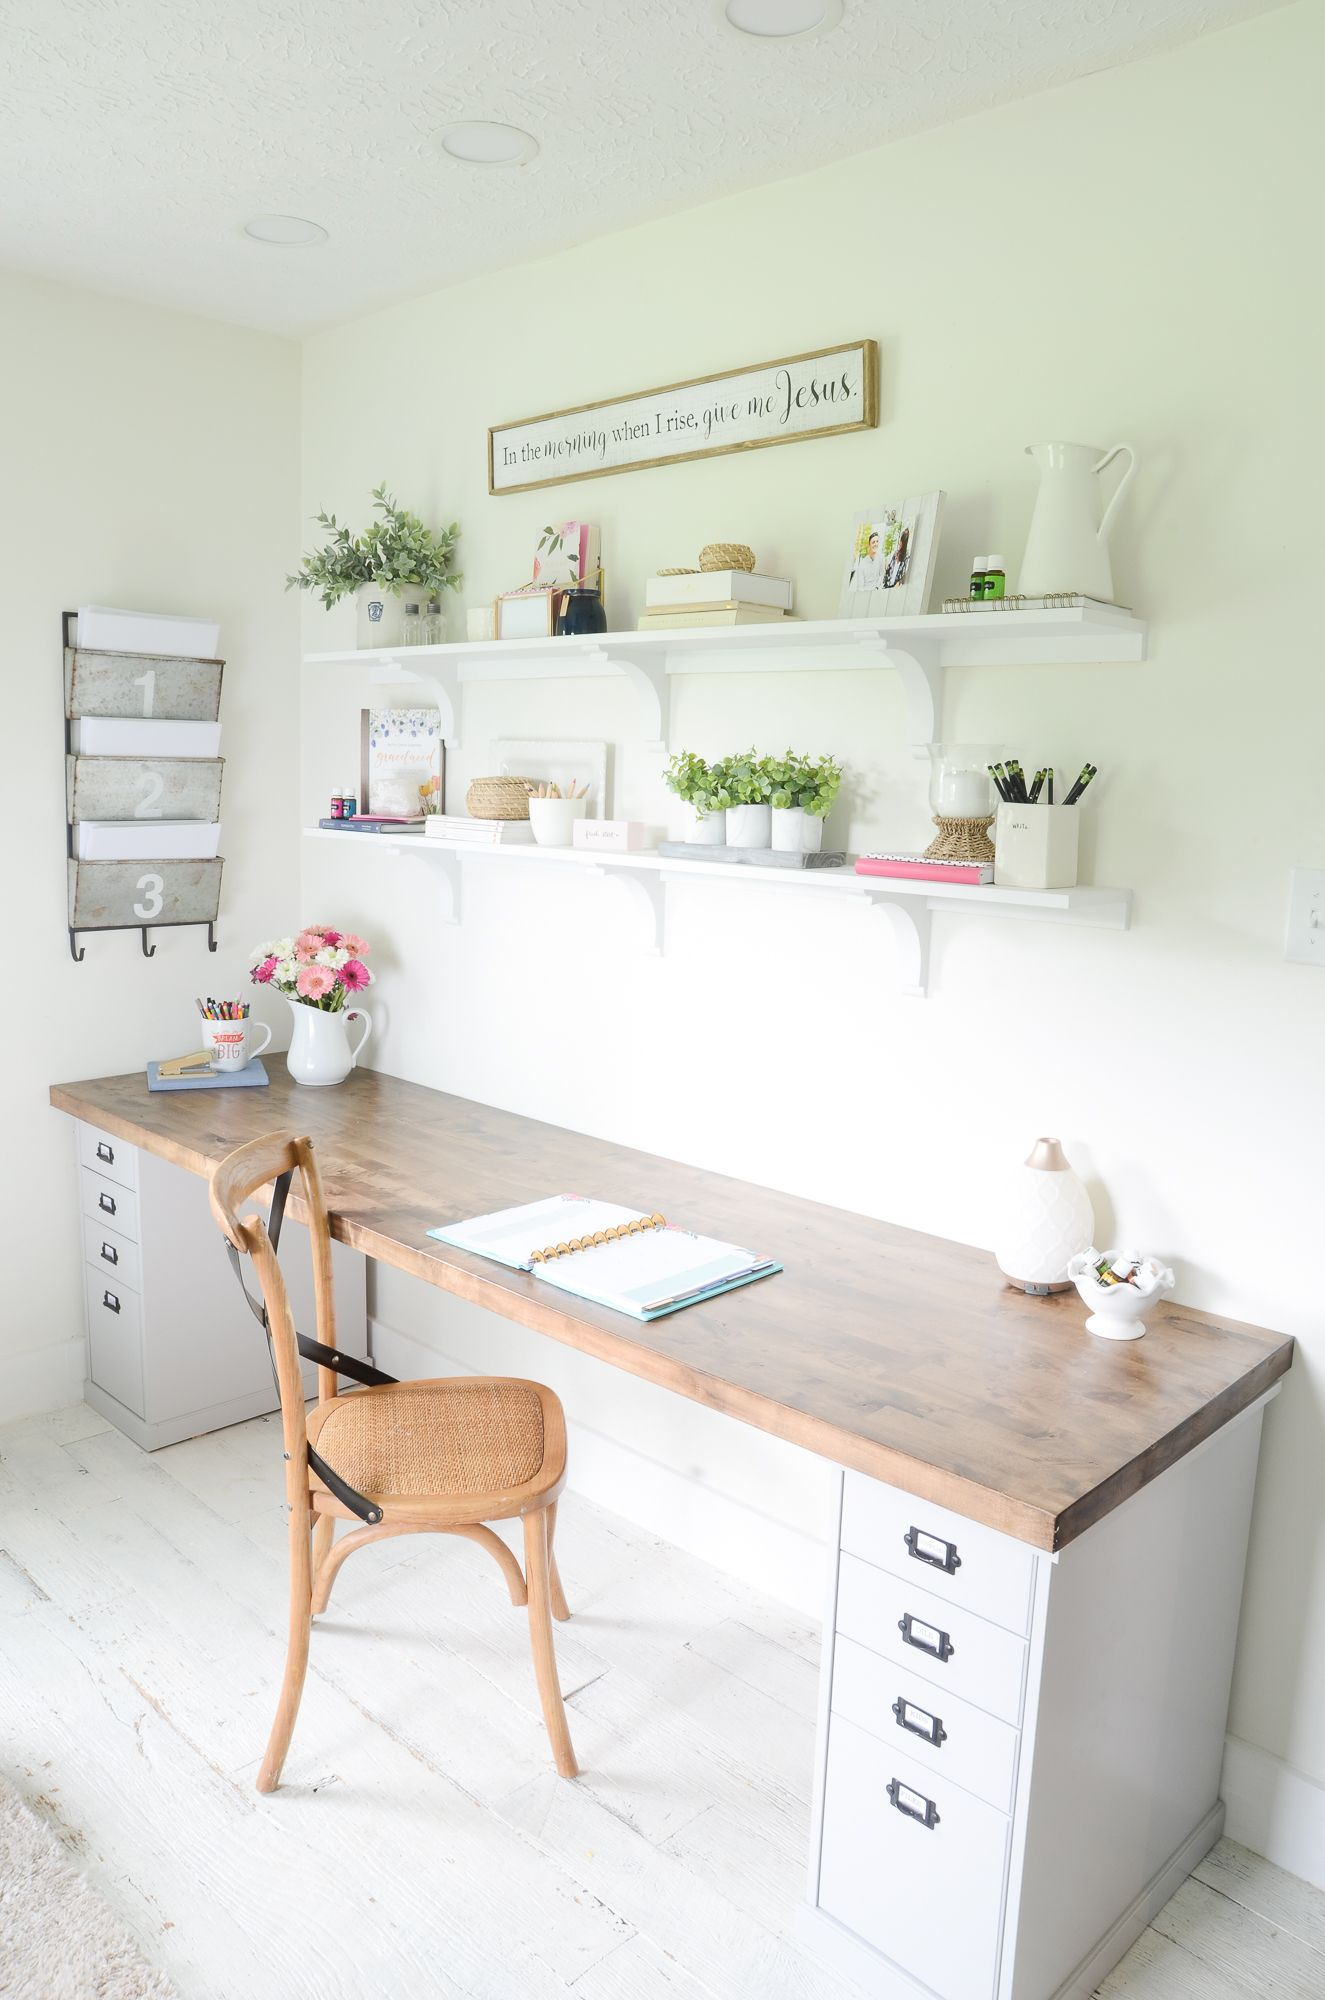 Einfache home-office-design-idee diy butcher block desk for my home office  great diy ideas